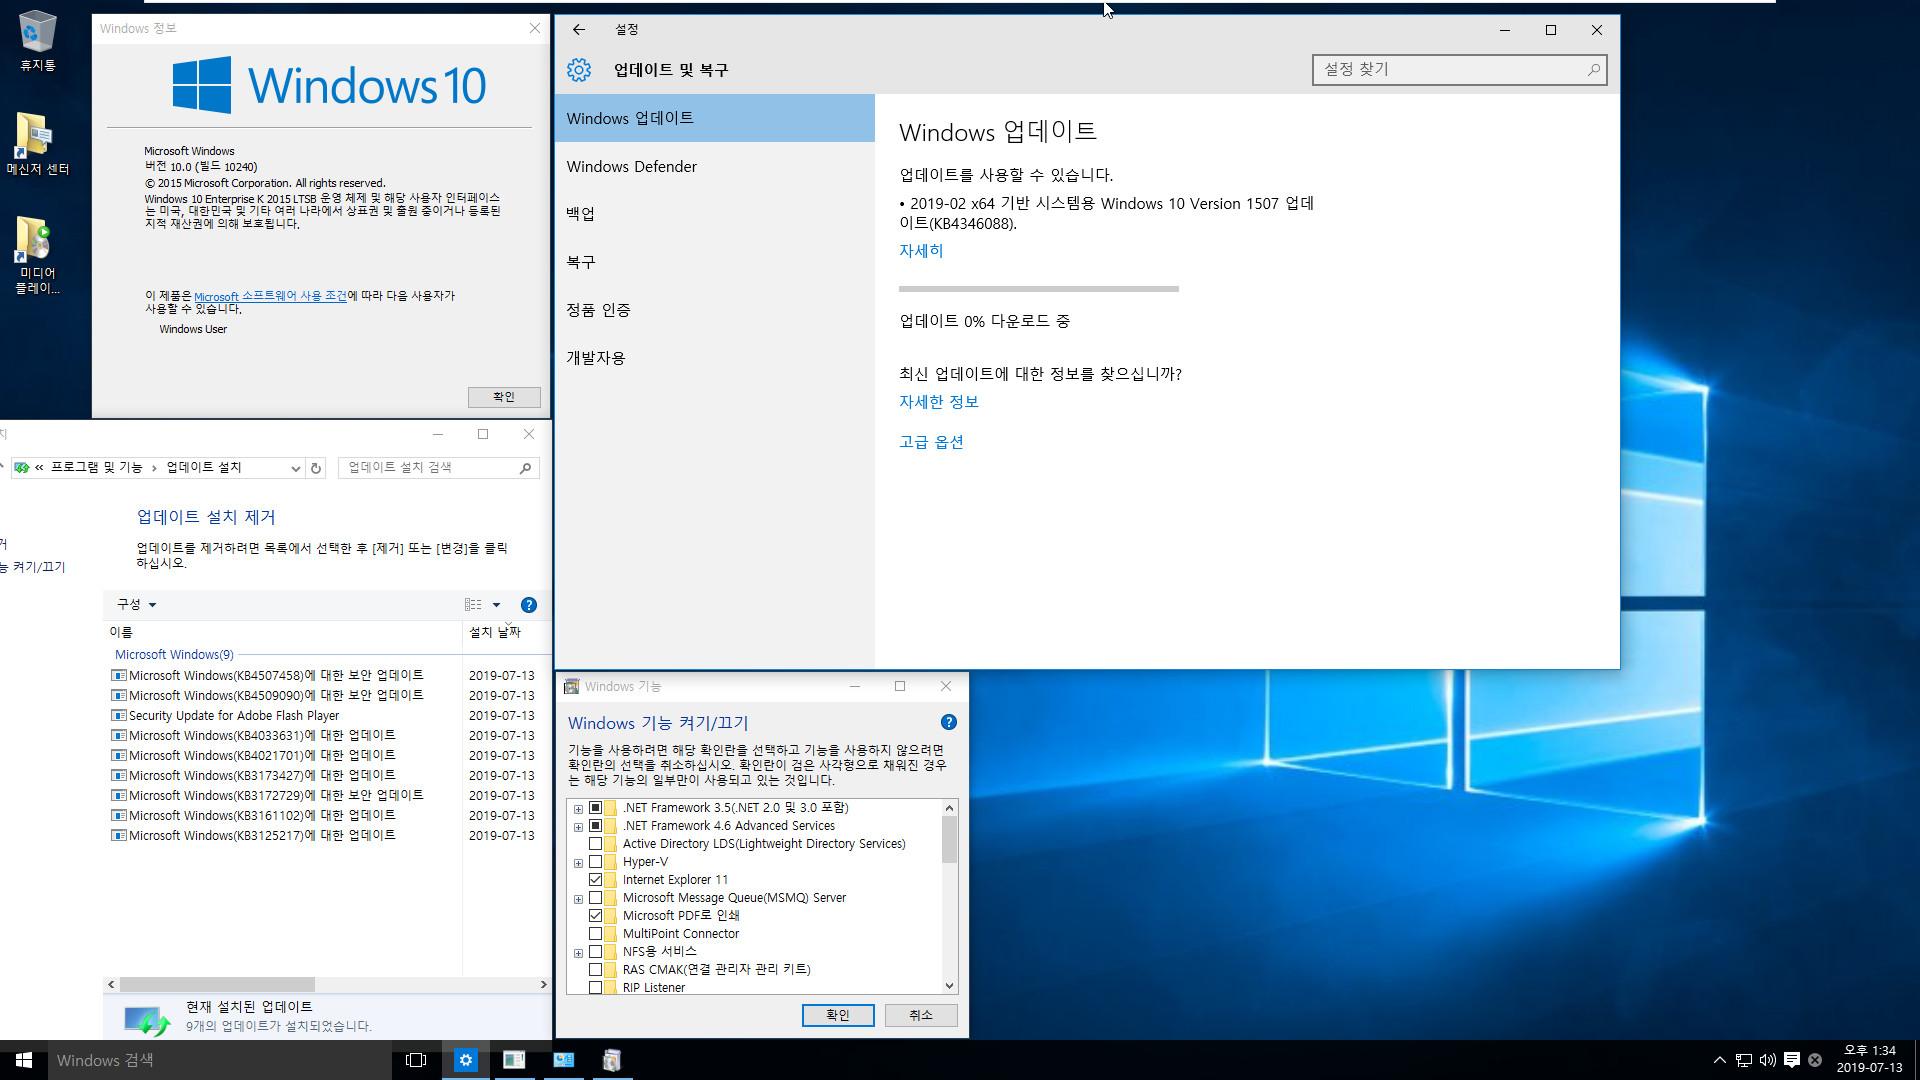 Windows 10 버전 1507 누적 업데이트 KB4507458 (OS 빌드 10240.18275) [2019-07-09 일자] 중에 2015 LTSB 통합중 입니다 - 64비트 업데이트 확인 2019-07-13_133421.jpg